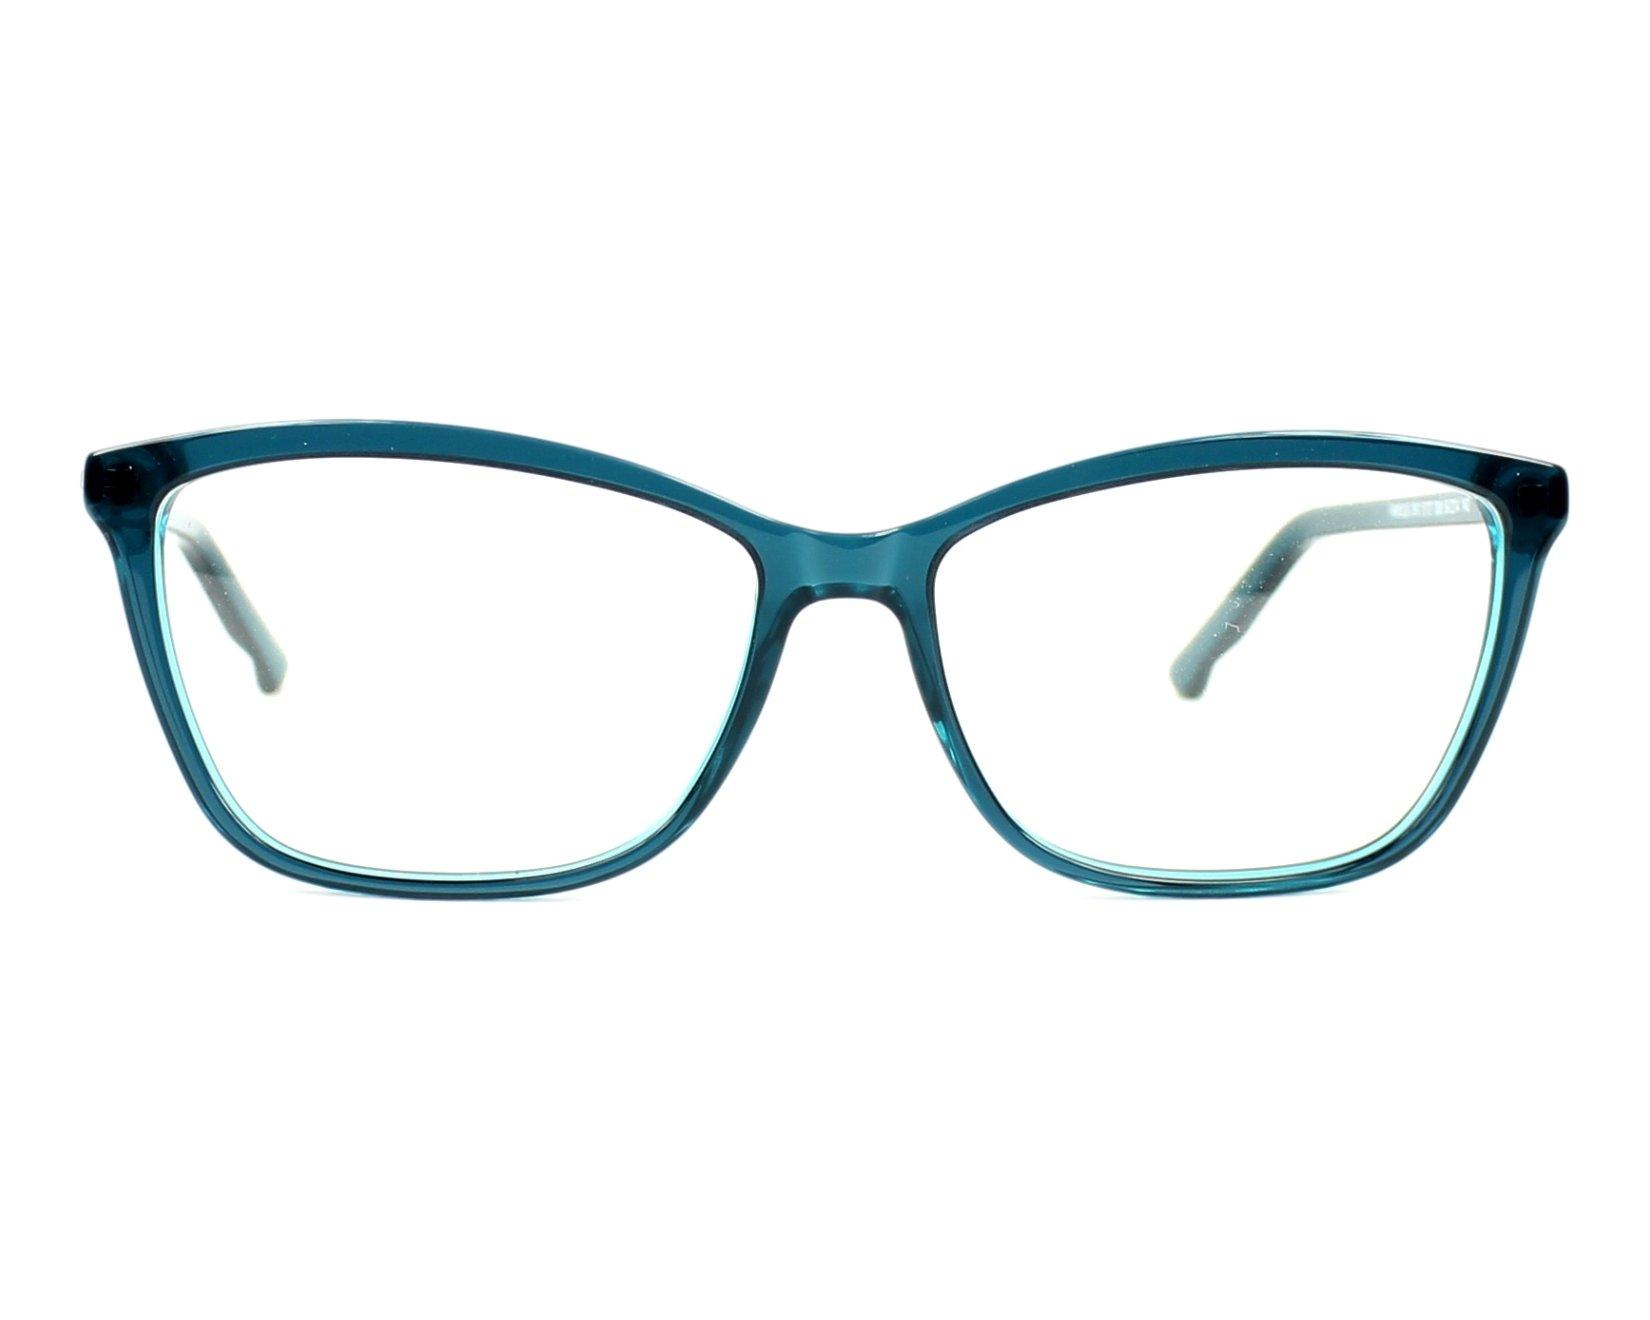 75a06f550f4 eyeglasses Swarovski SW-5137 098 54-14 Green Green front view